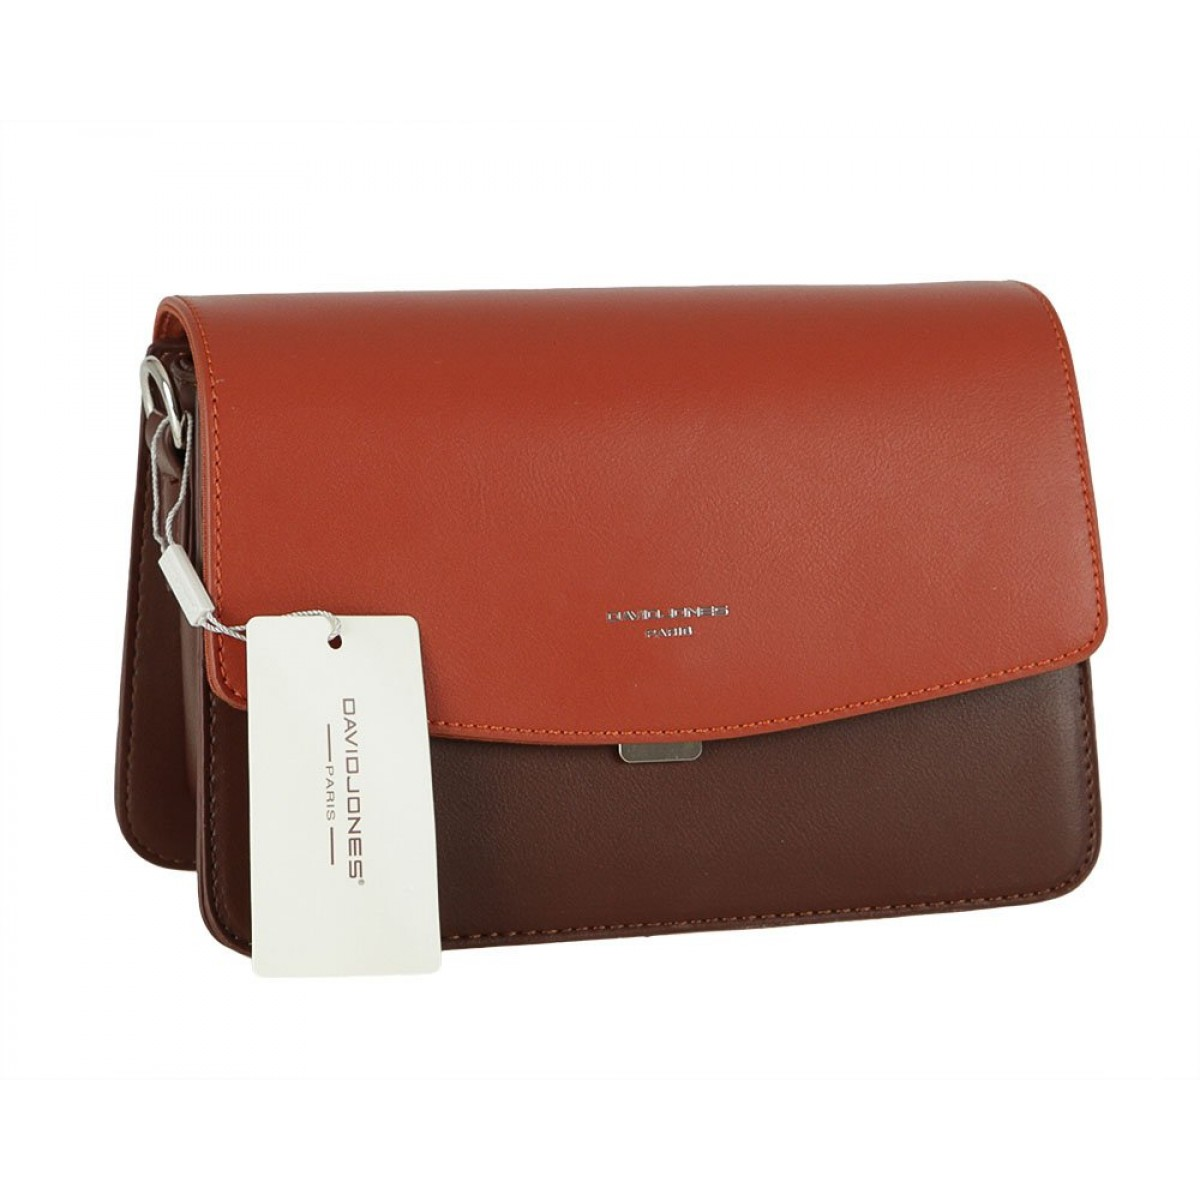 Жіноча сумка David Jones CM5825 D.BROWN